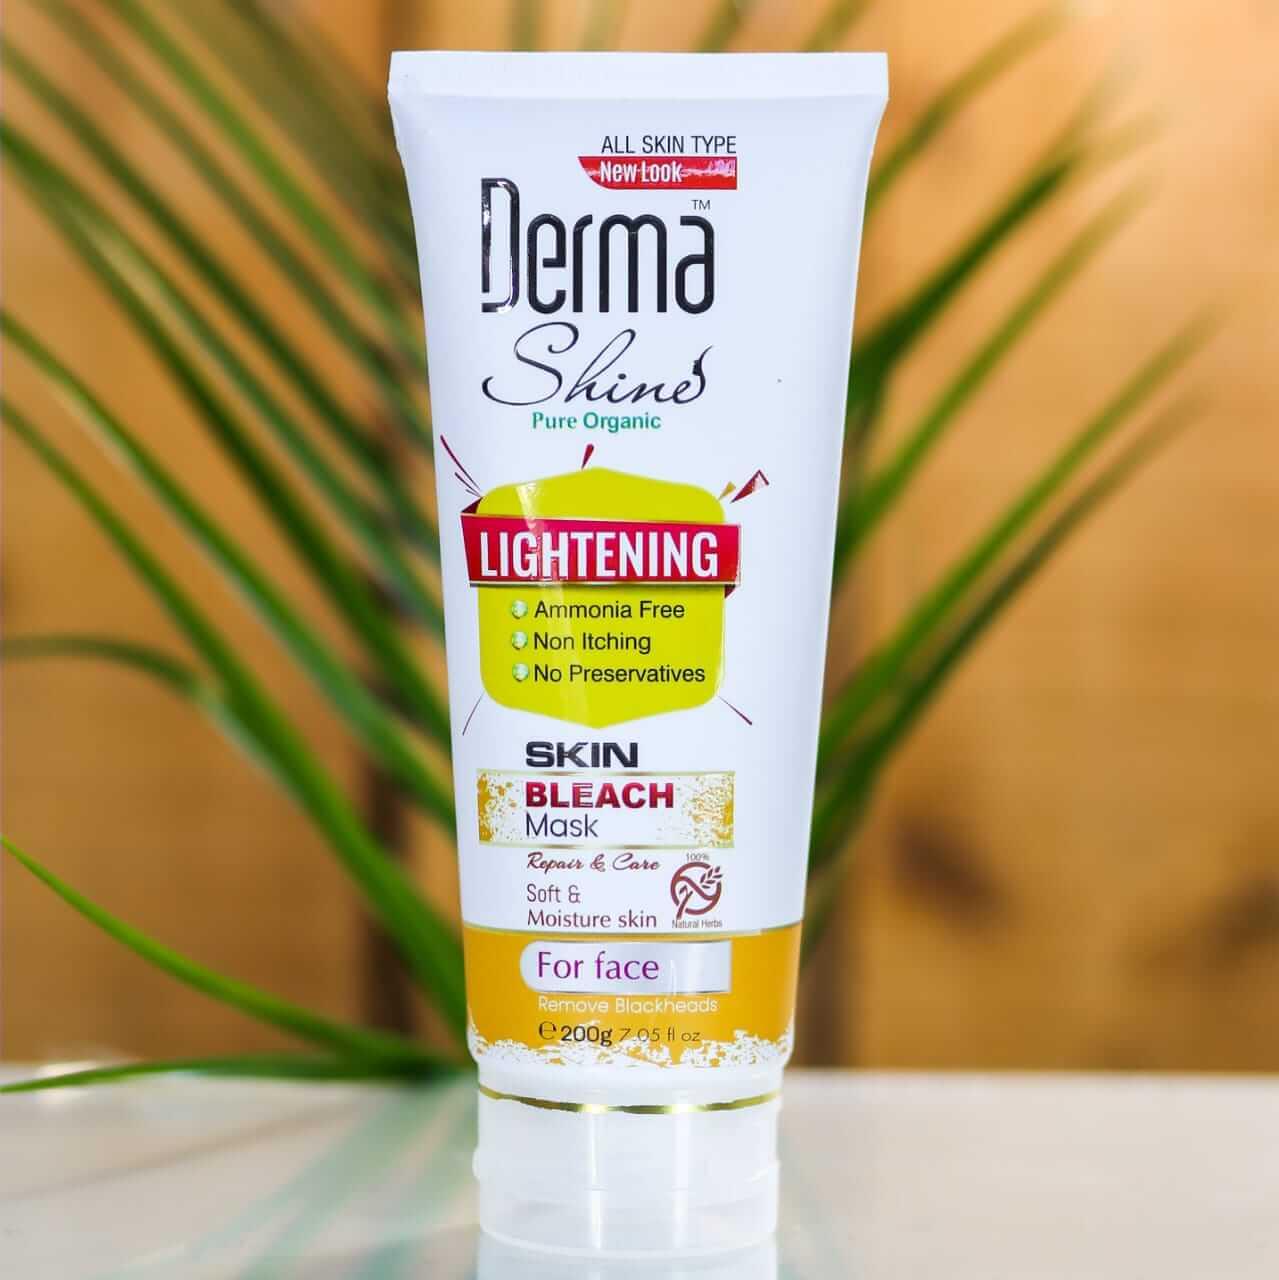 derma shine bleach mask price sanwarna.pk